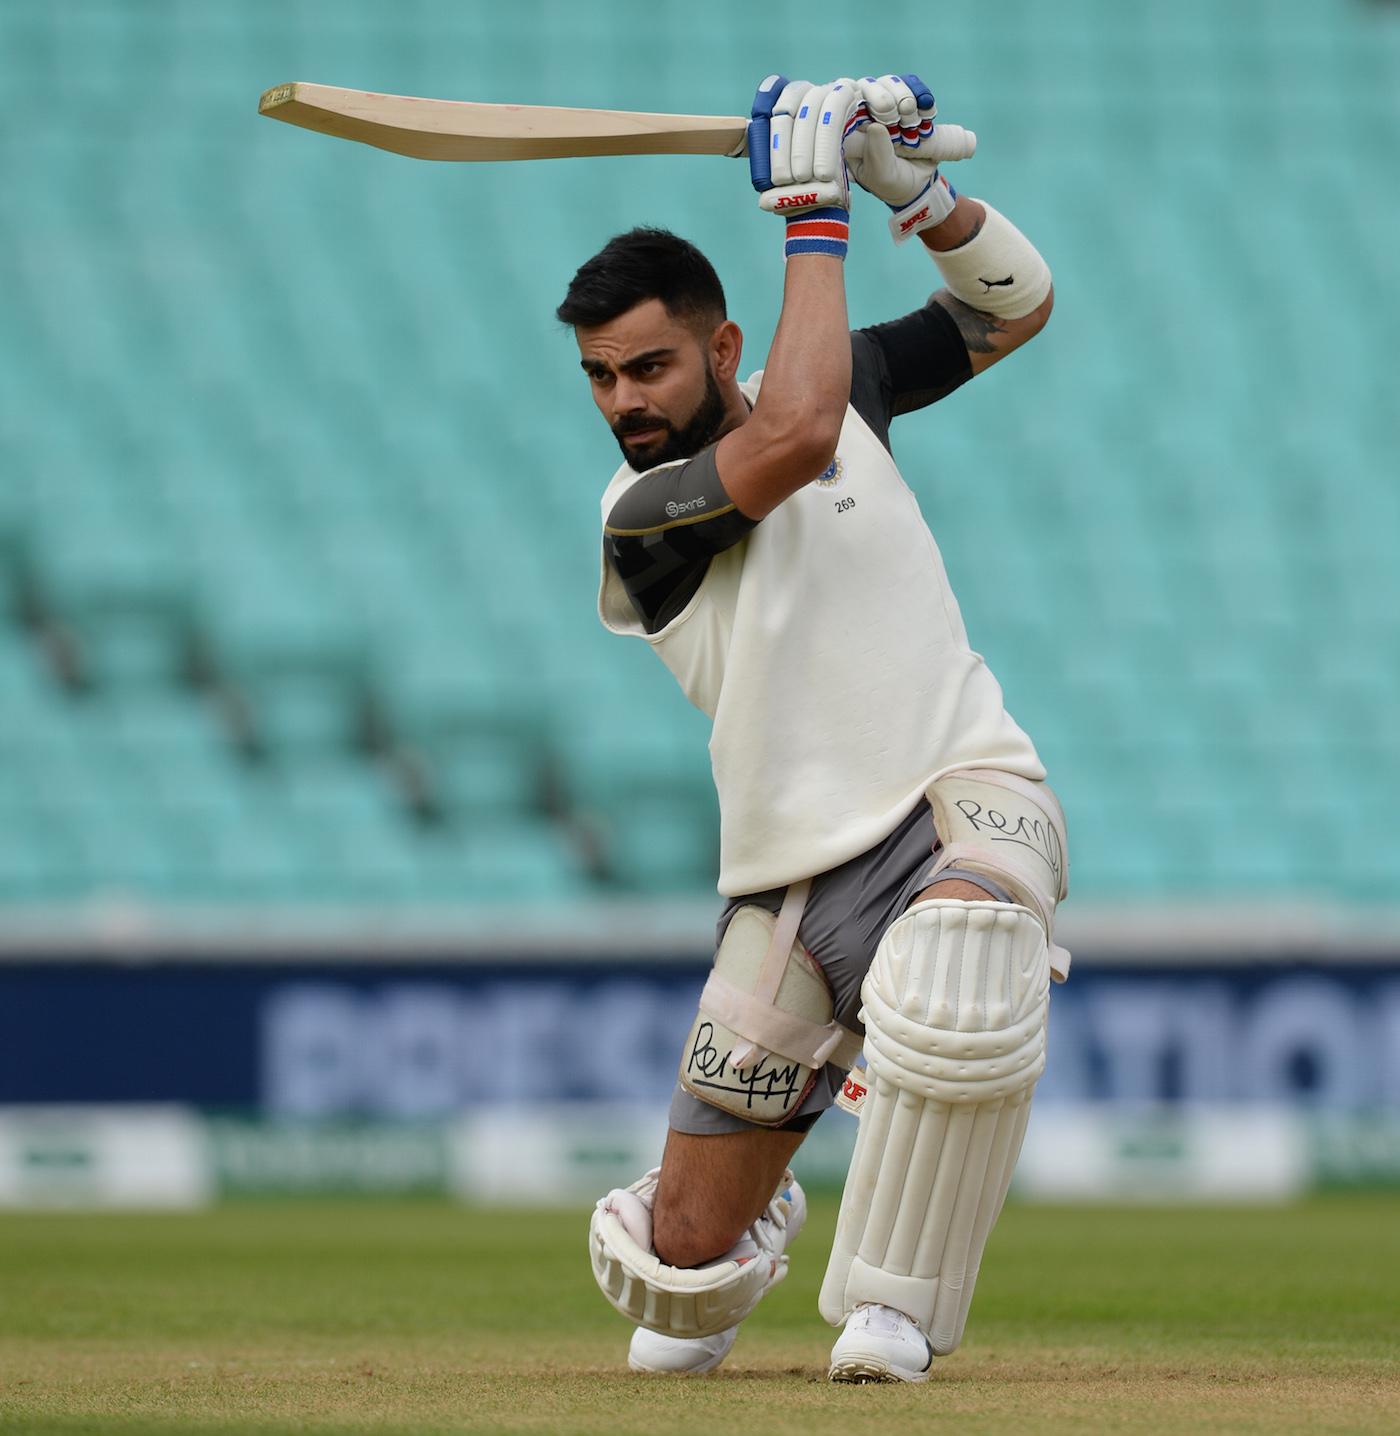 Virat Kohli Set To Undergo Yo-Yo Test Ahead Of West Indies series: Report